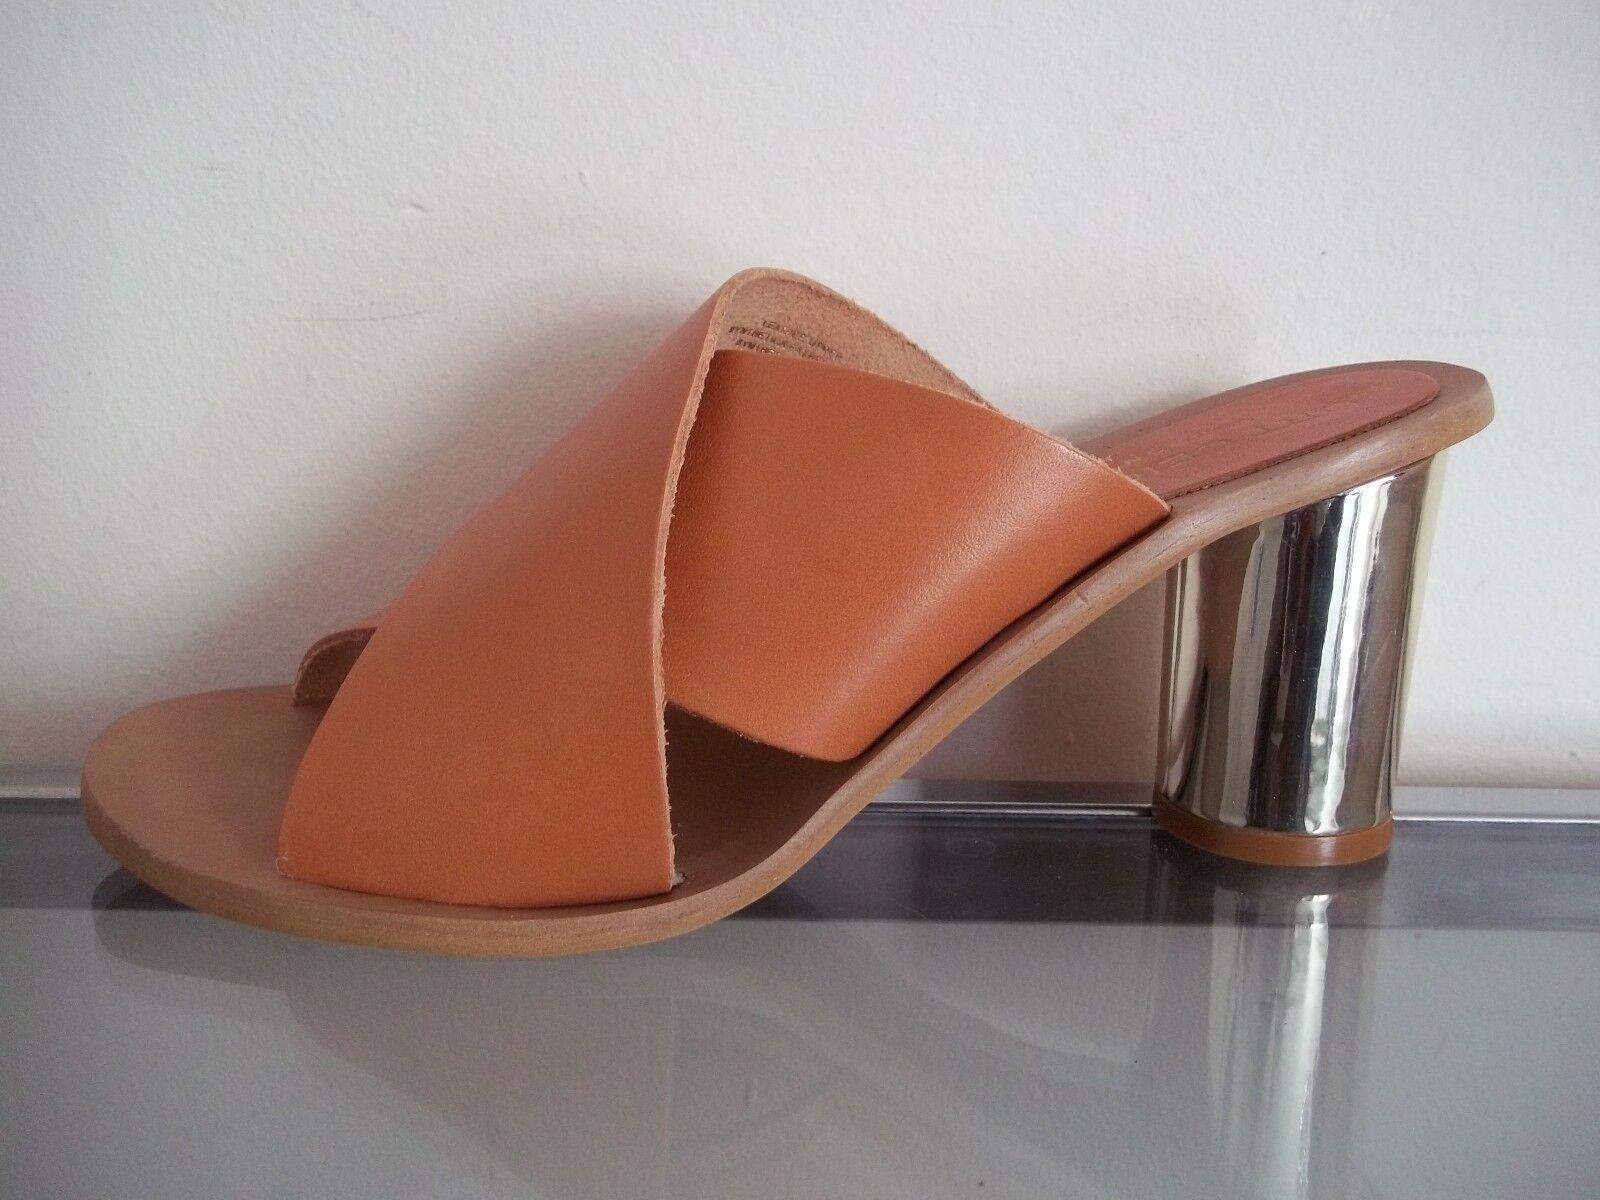 Kurt Geiger London Aubrey Tan Leather Mules Größes UK 5 38, 6 39, 7 40